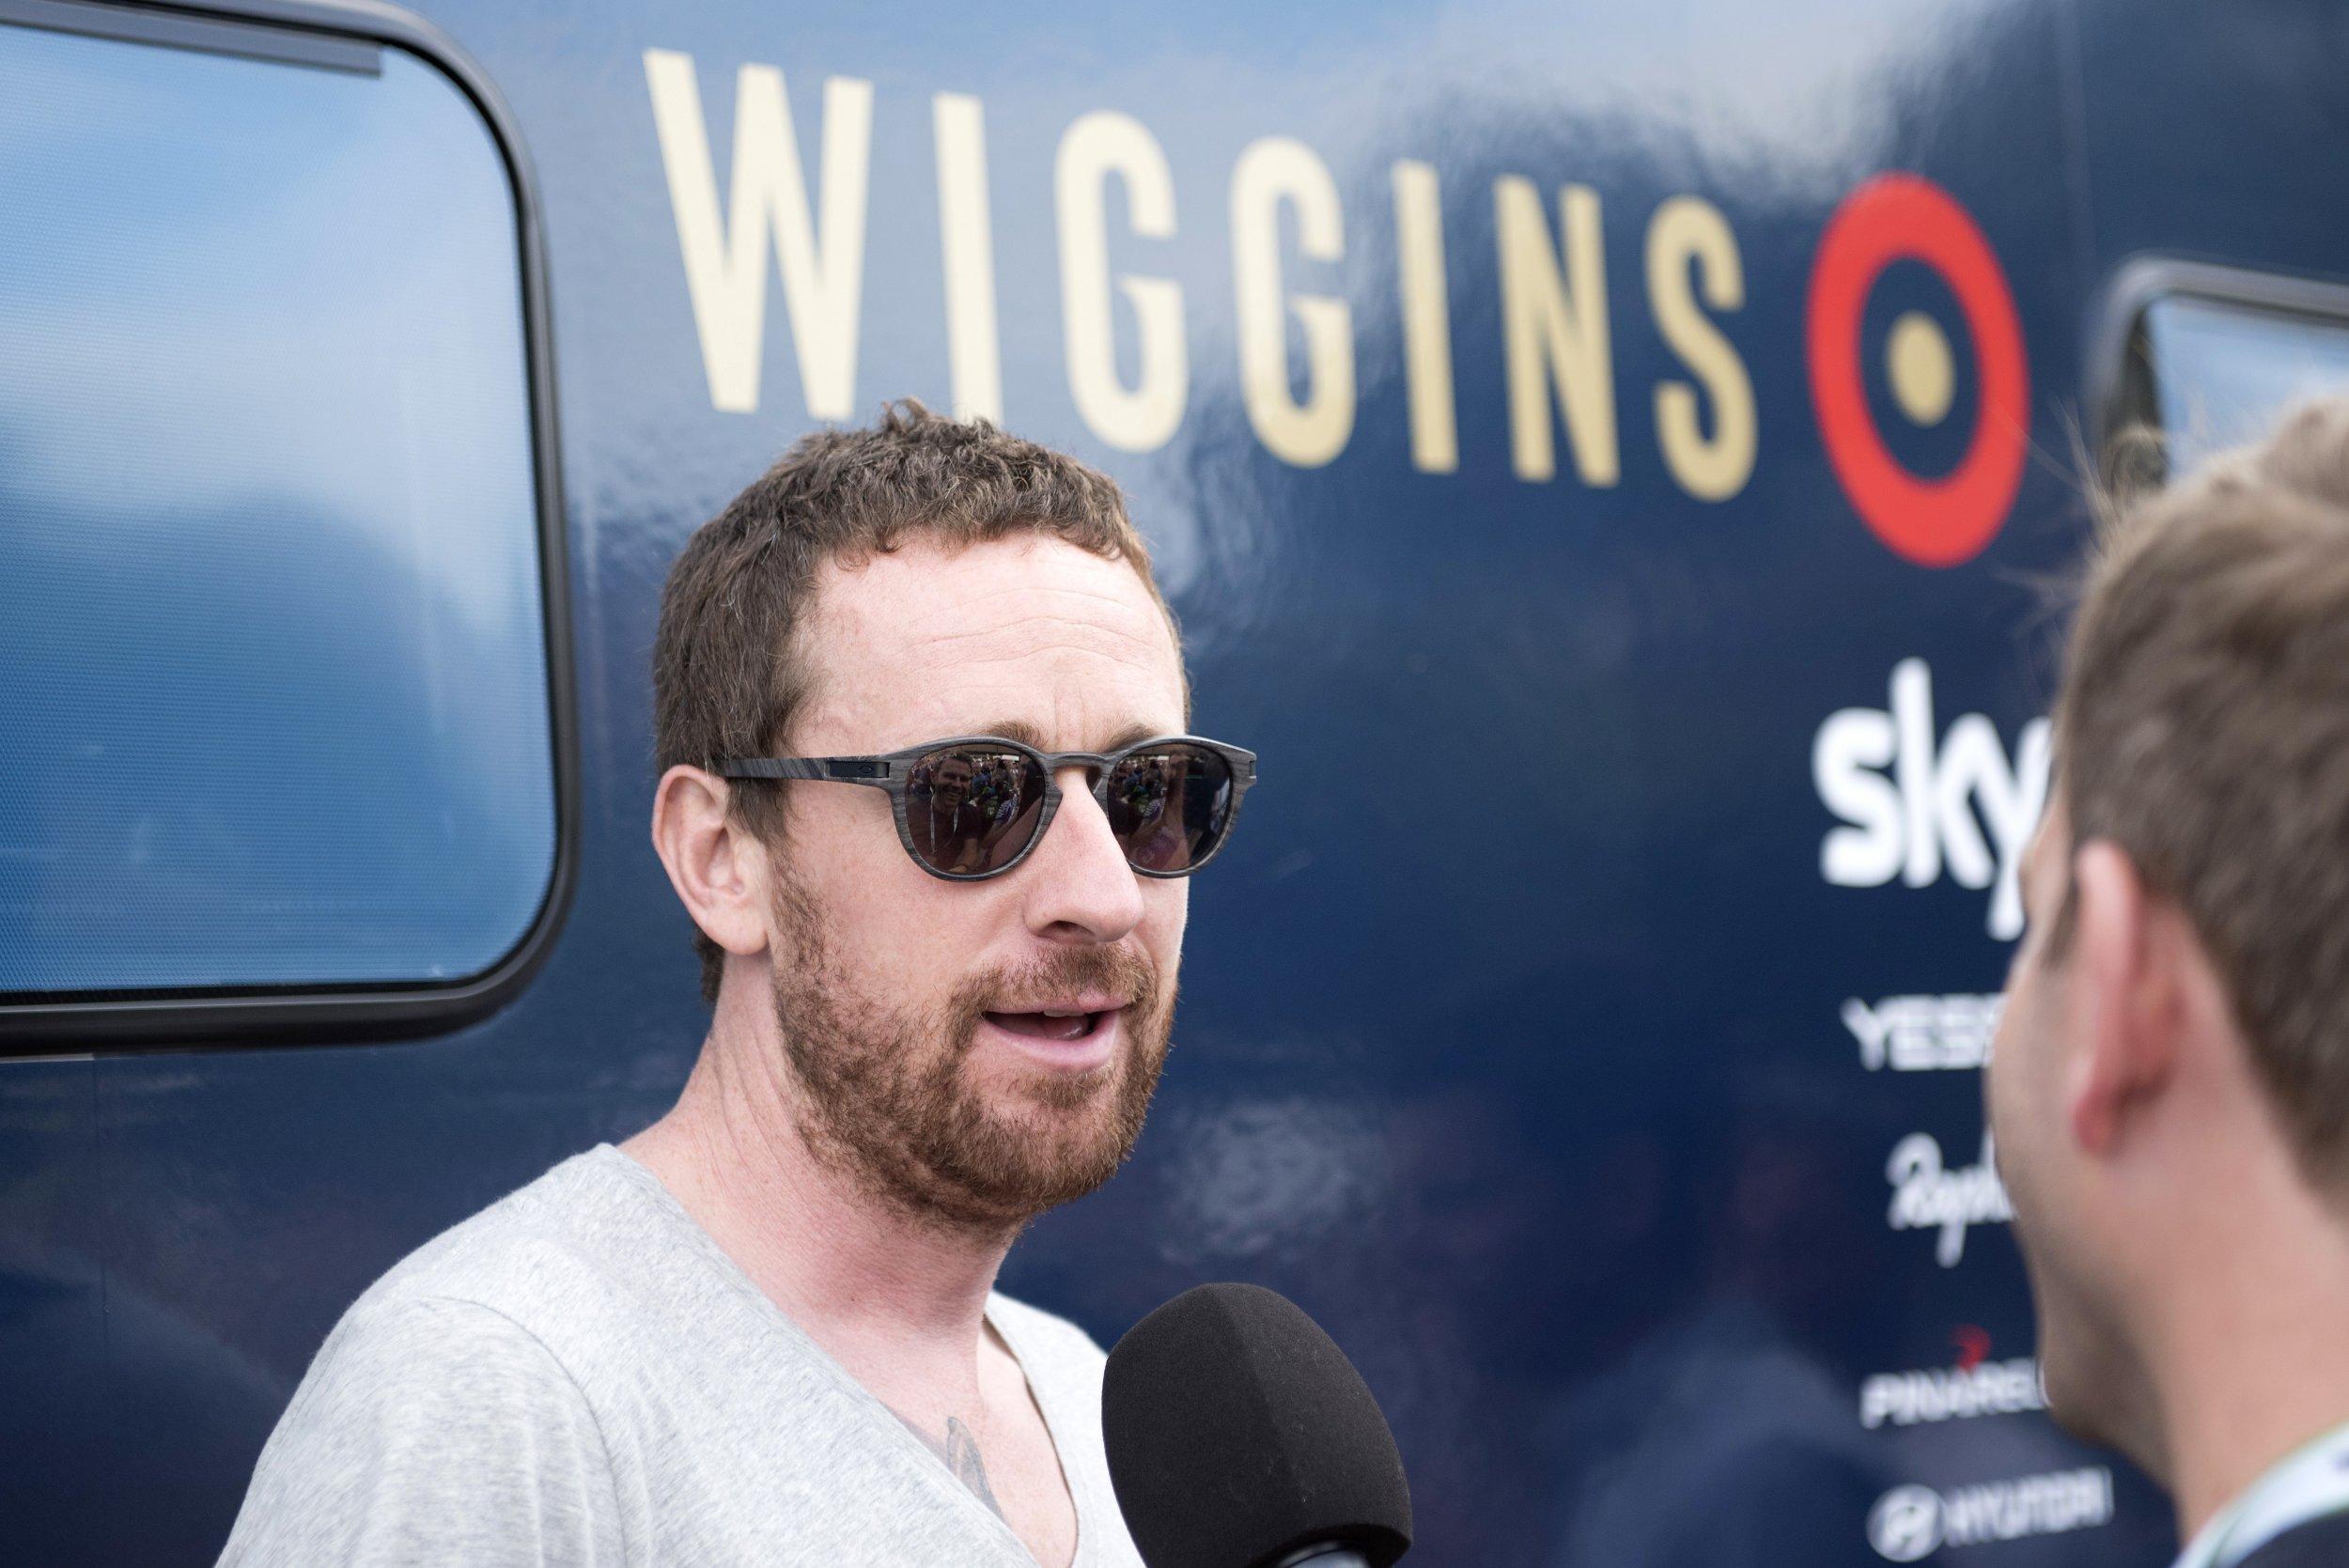 Tour de France winning cyclist Sir Bradley Wiggins